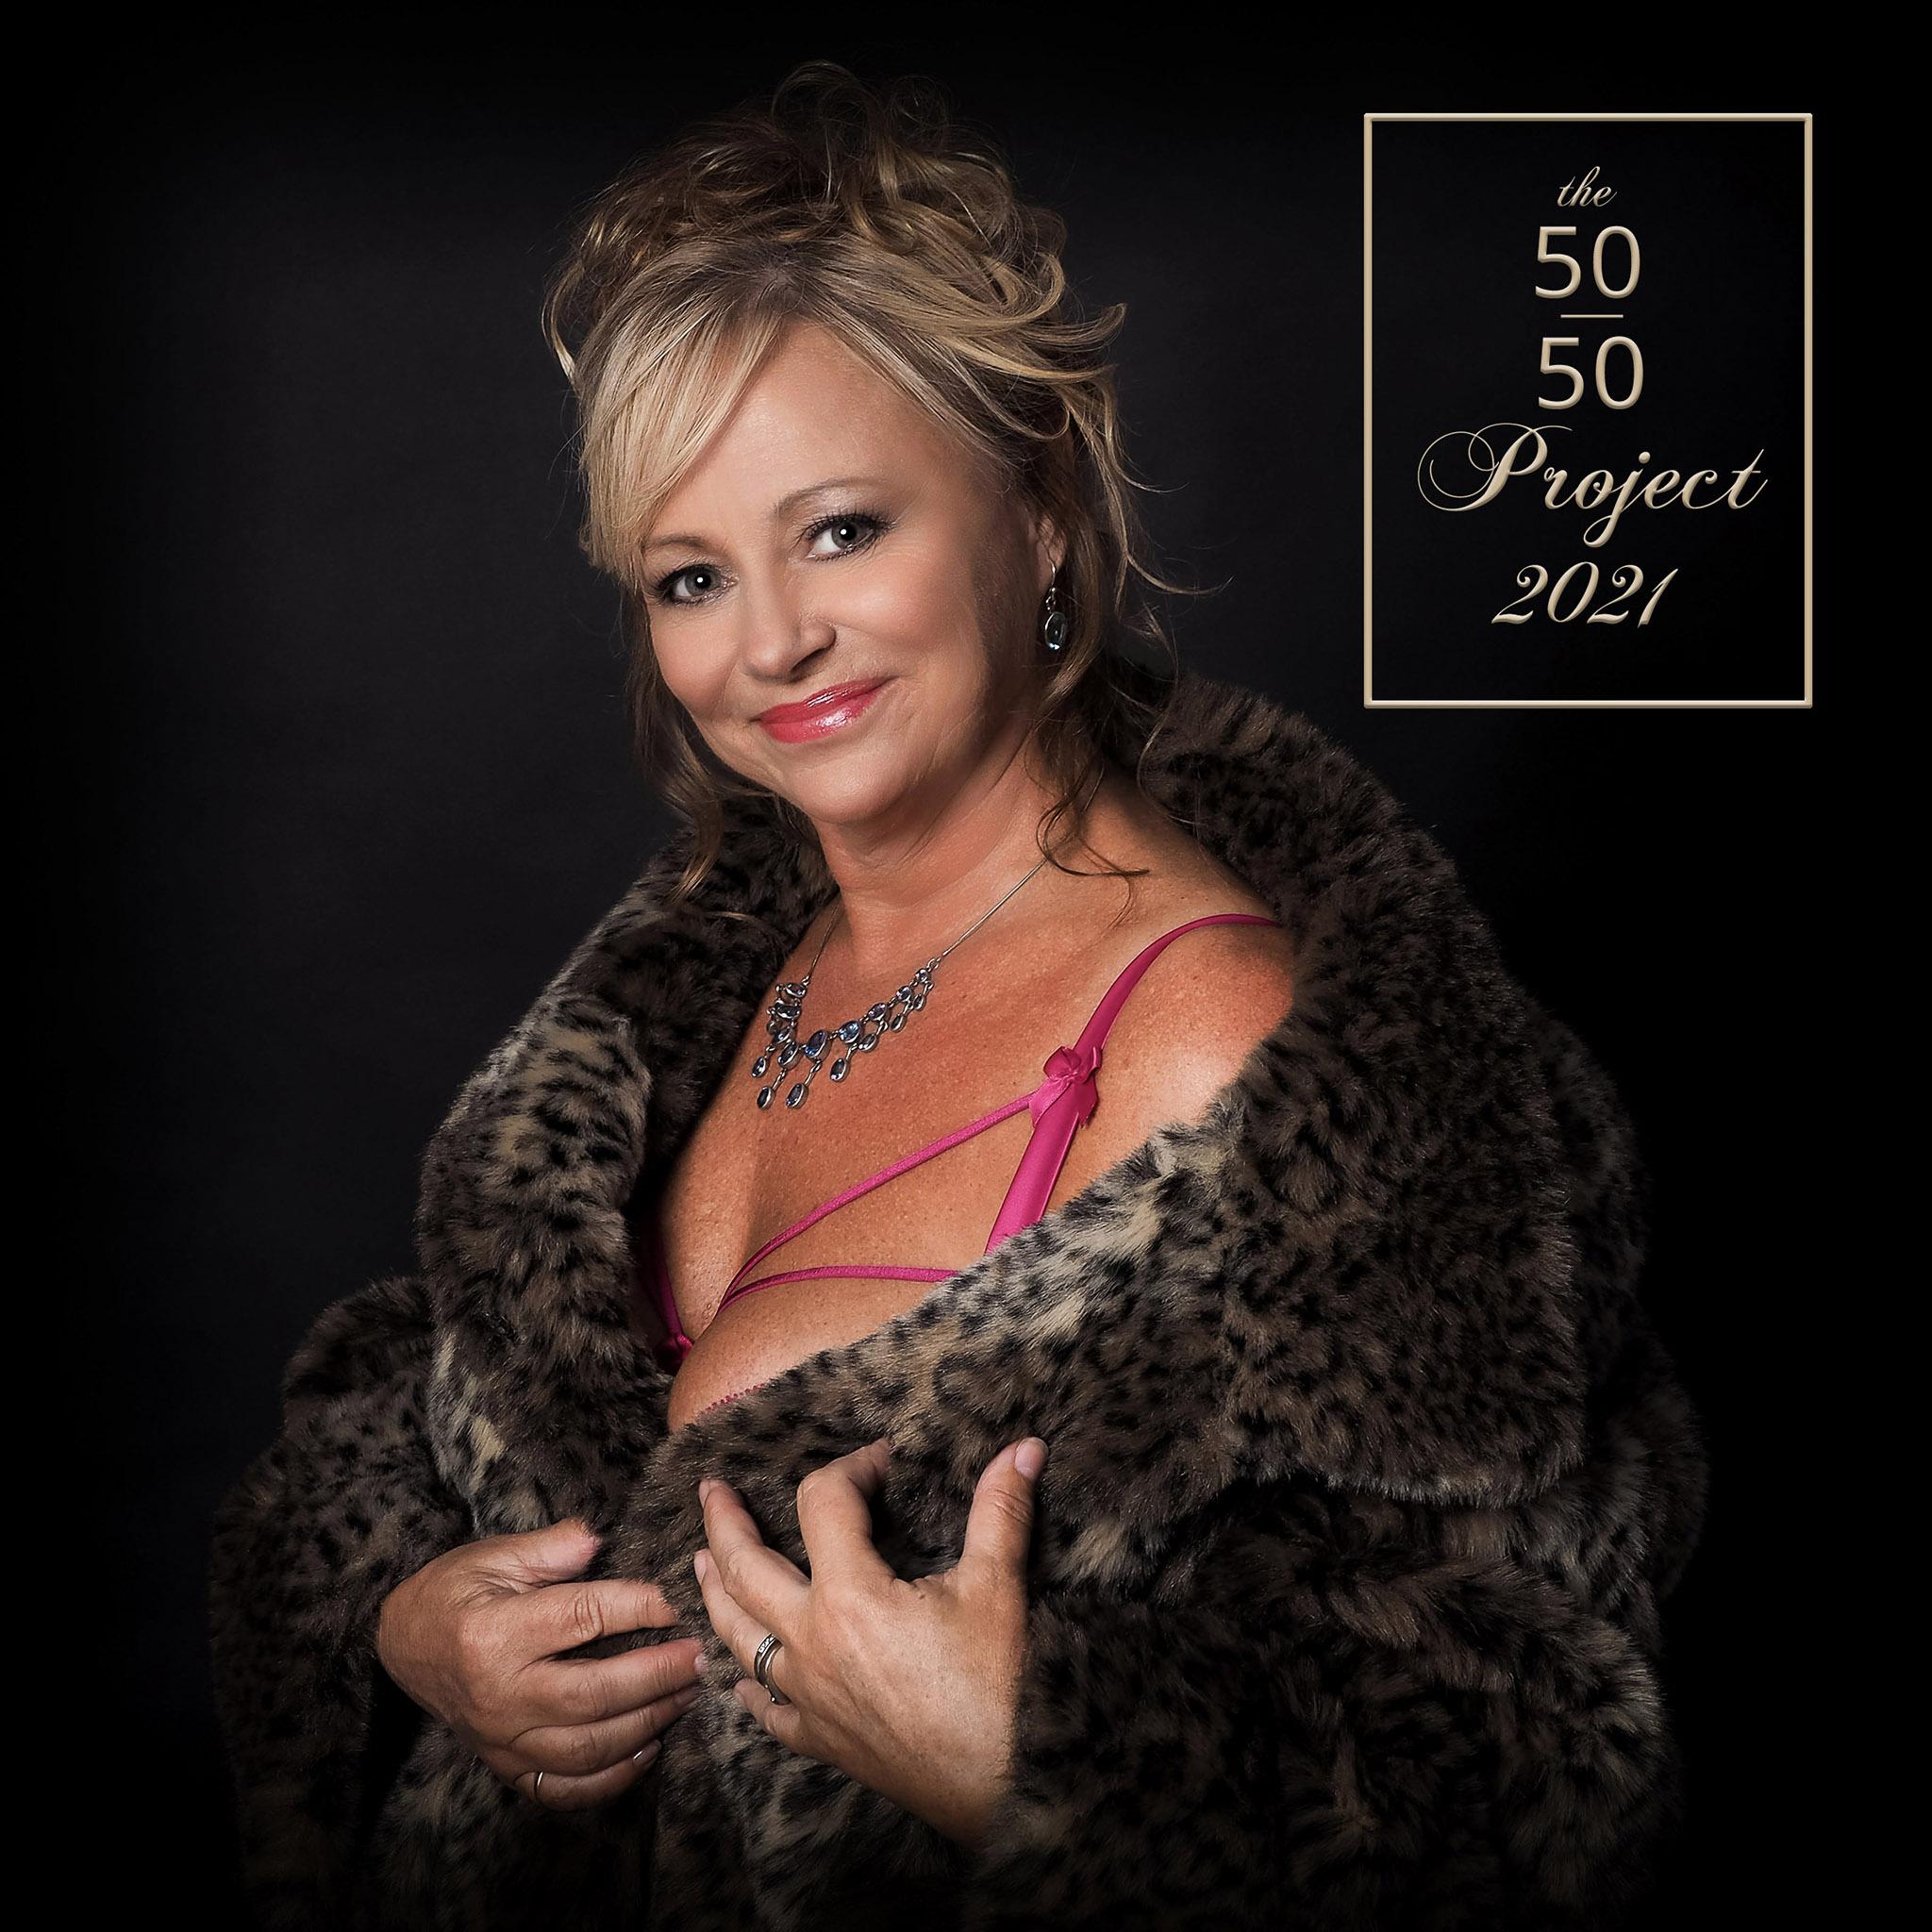 Boudoir photoshoot mature woman